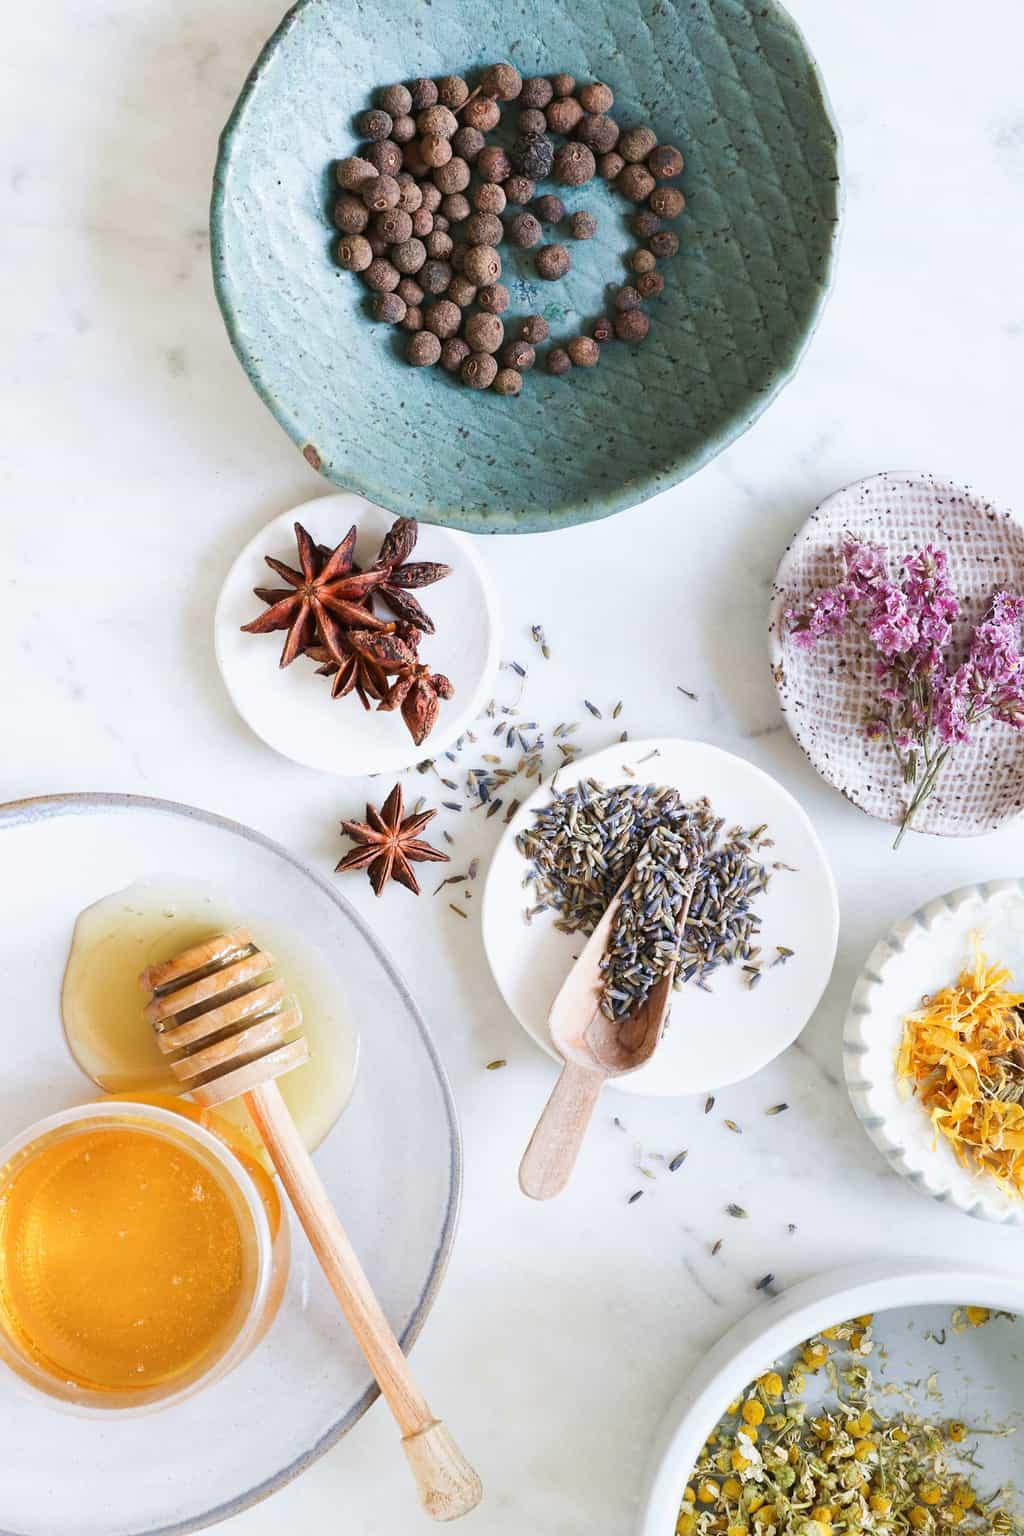 Infused honey flavor ideas